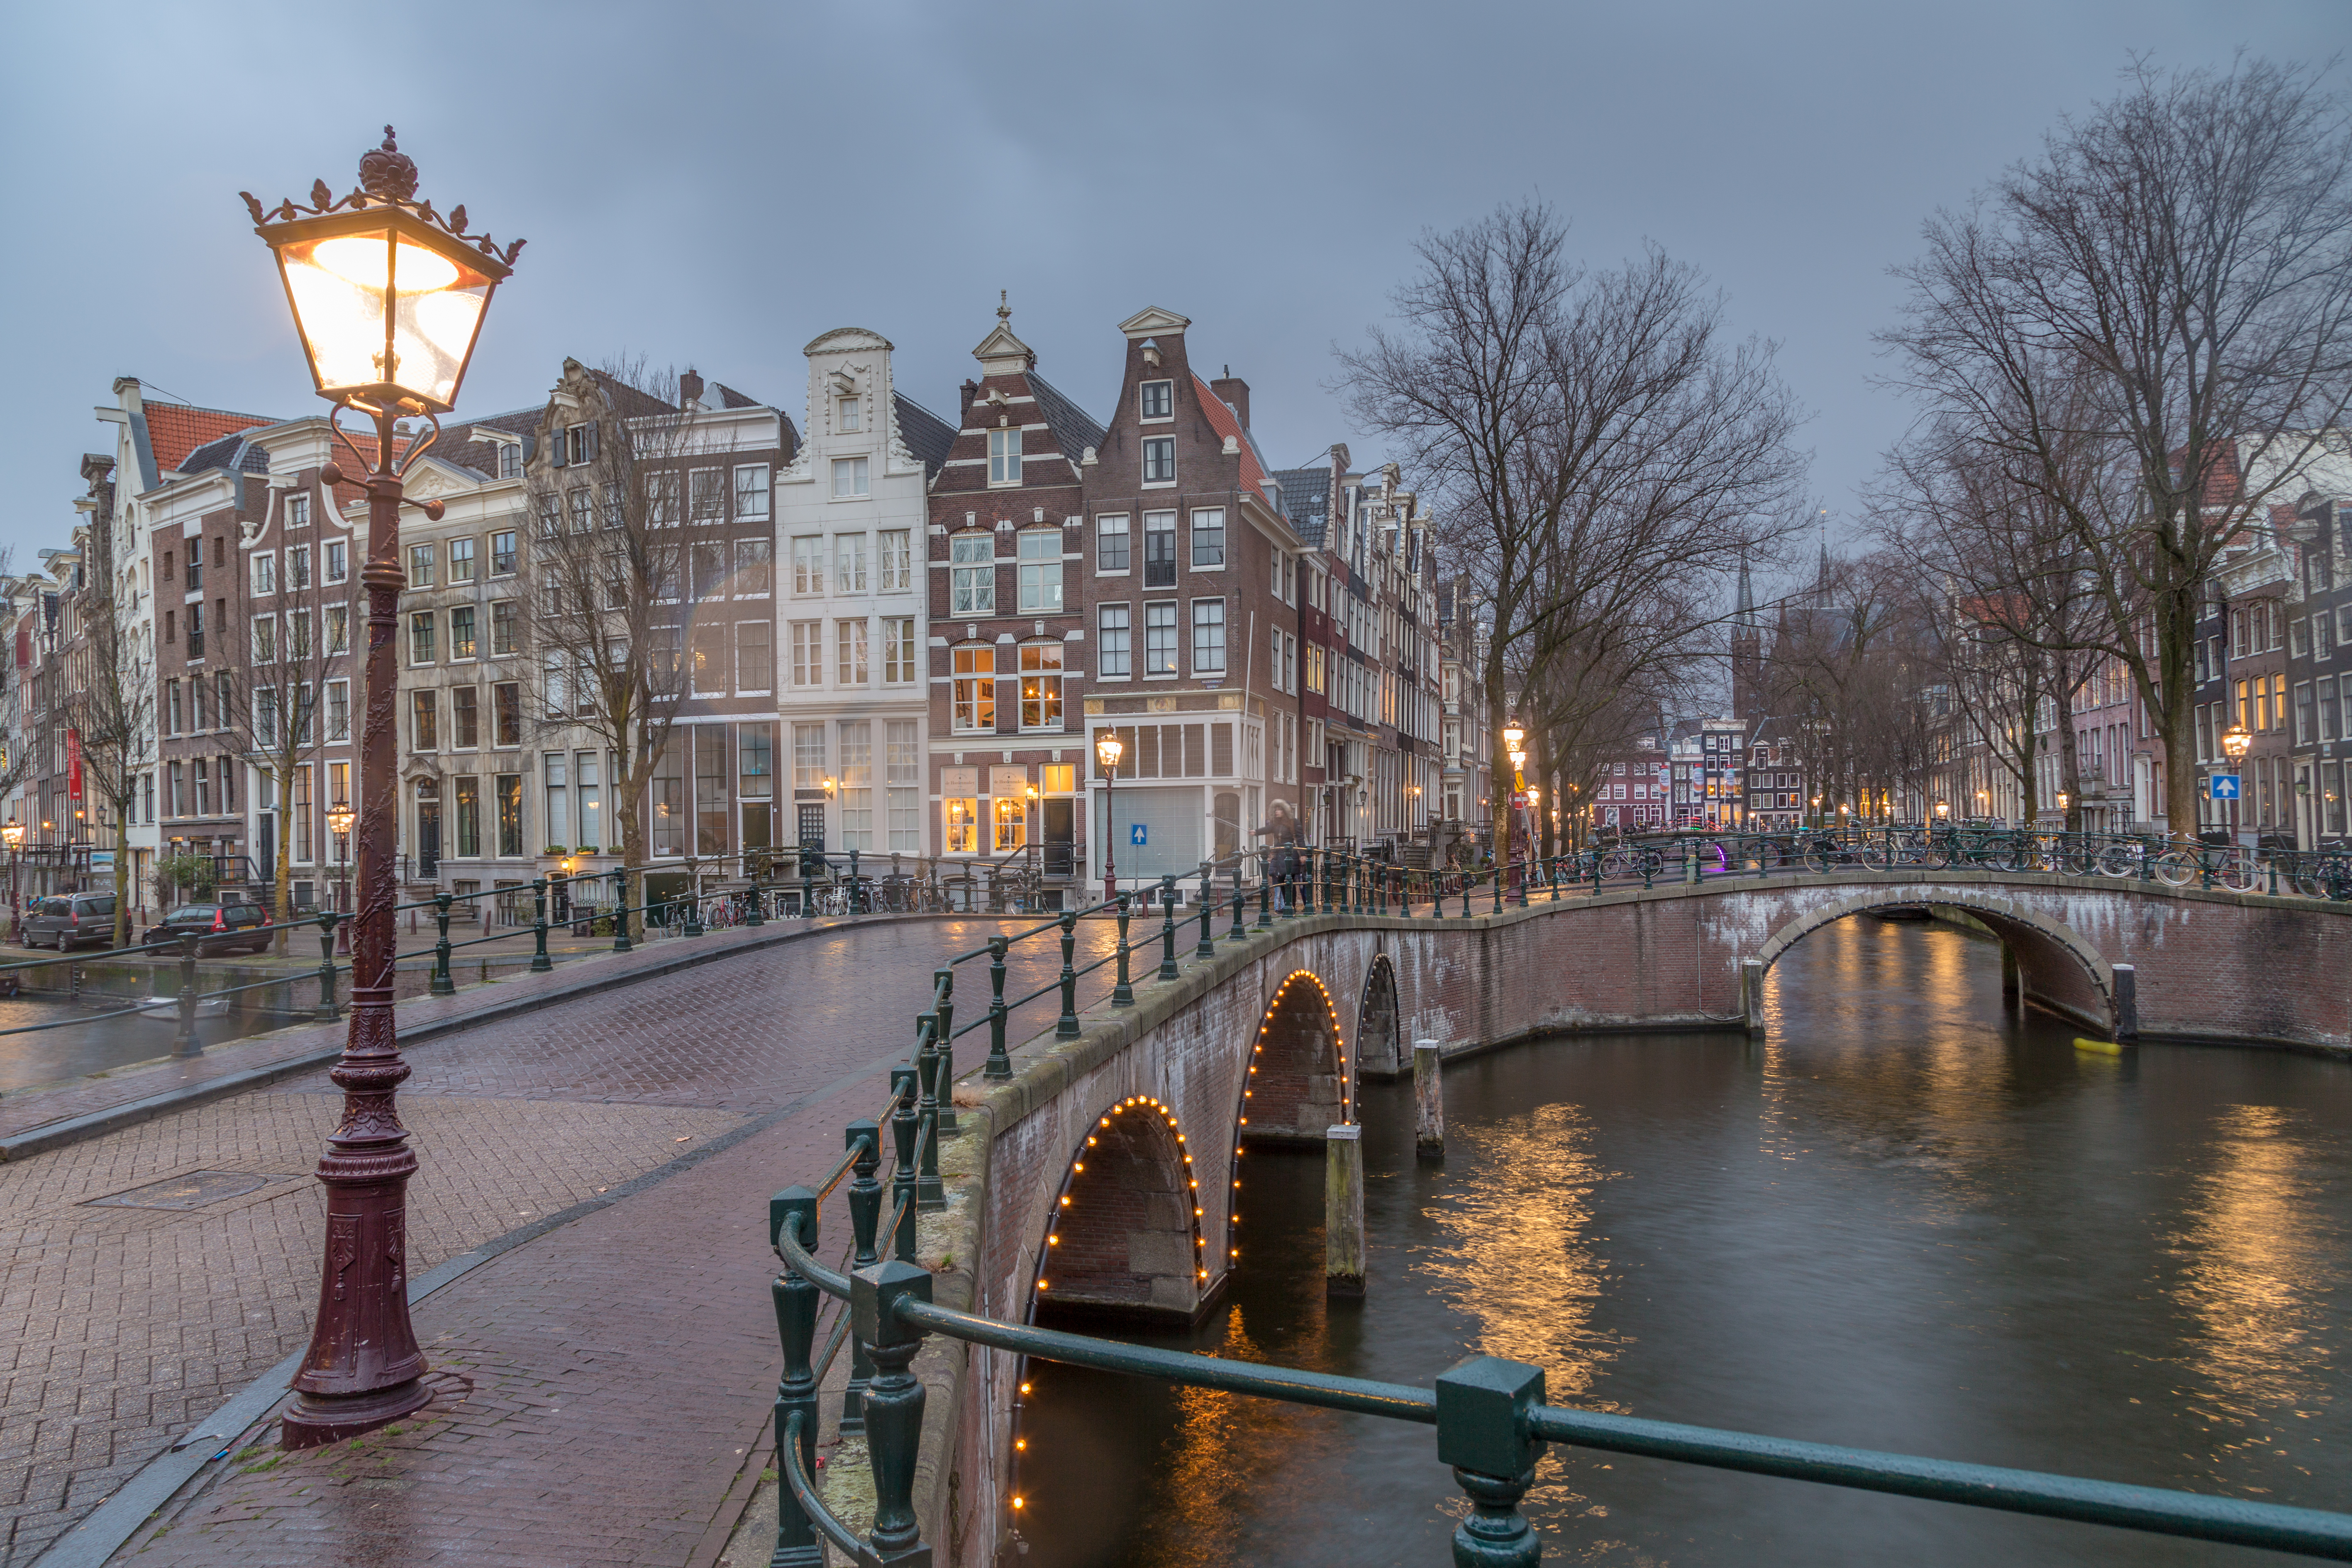 Gracht, Amsterdam, Netherlands